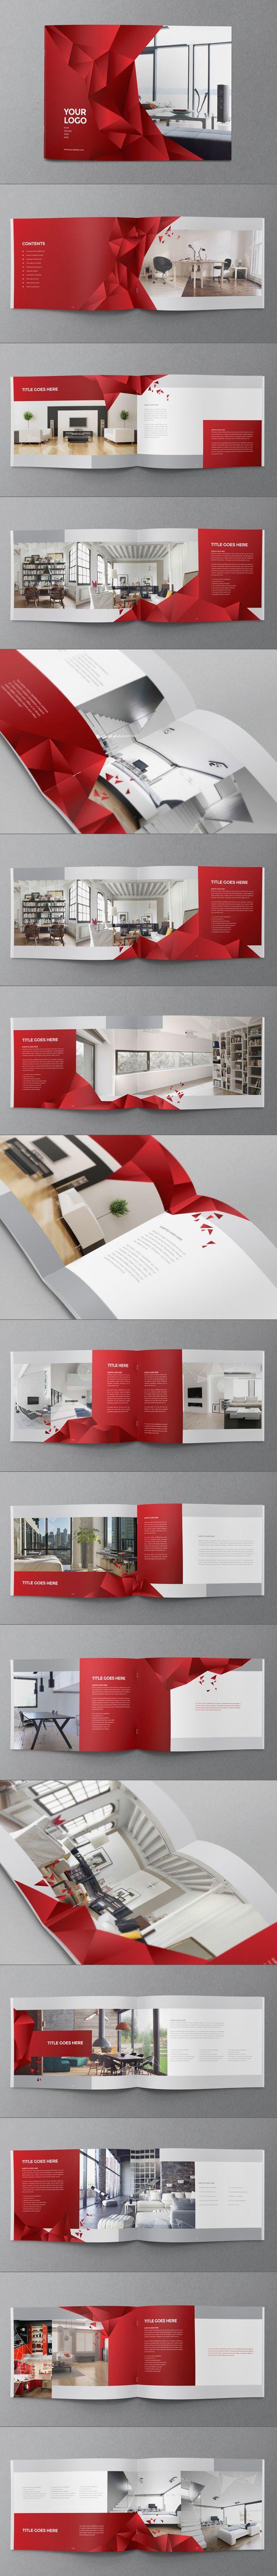 Interior Design Brochure By Abra Via Behance